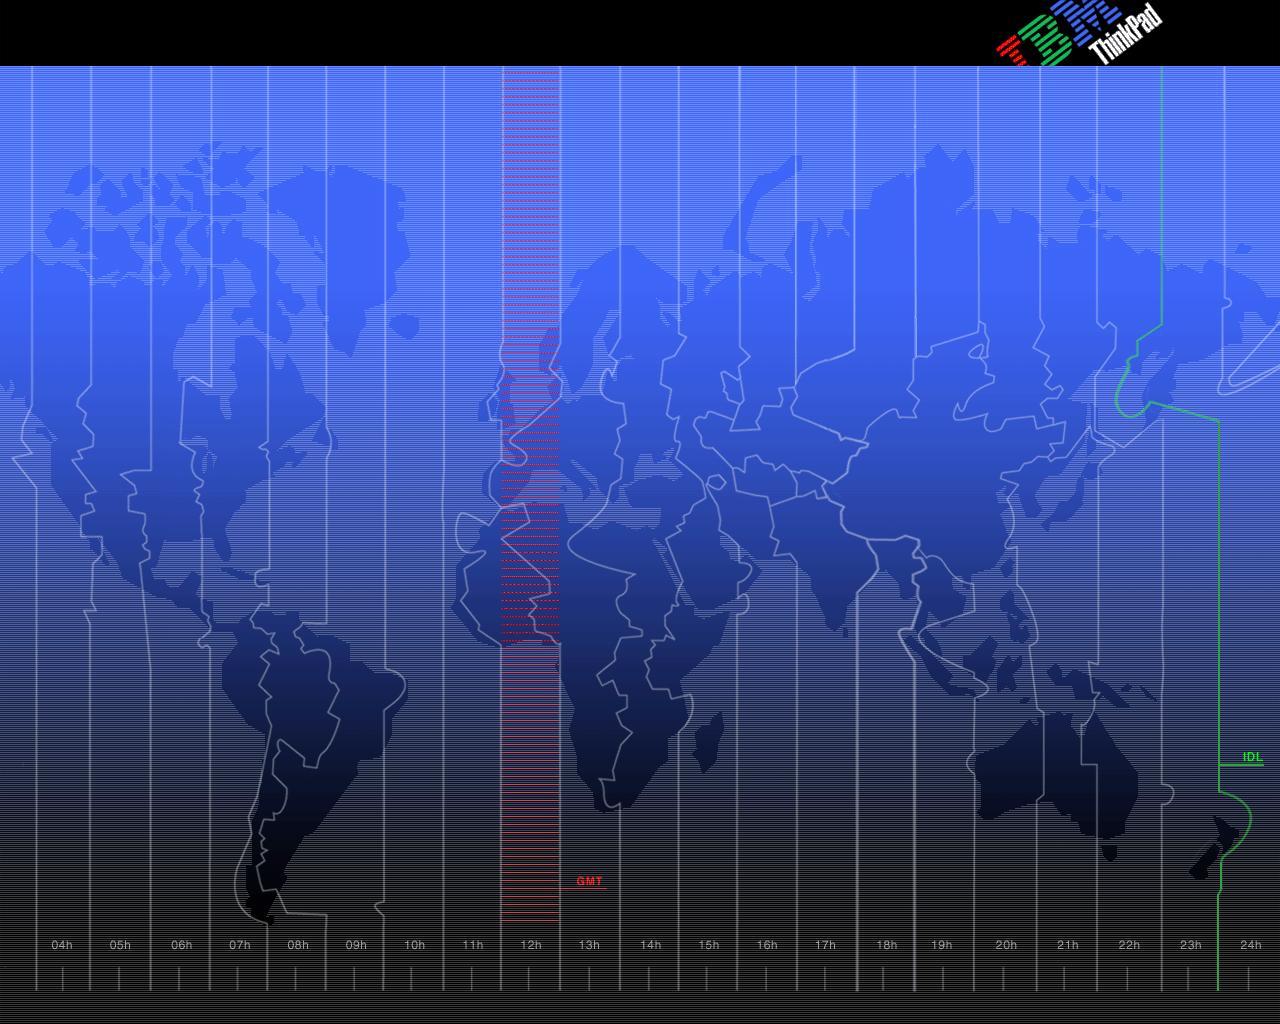 ThinkPad 1280x1024 Map